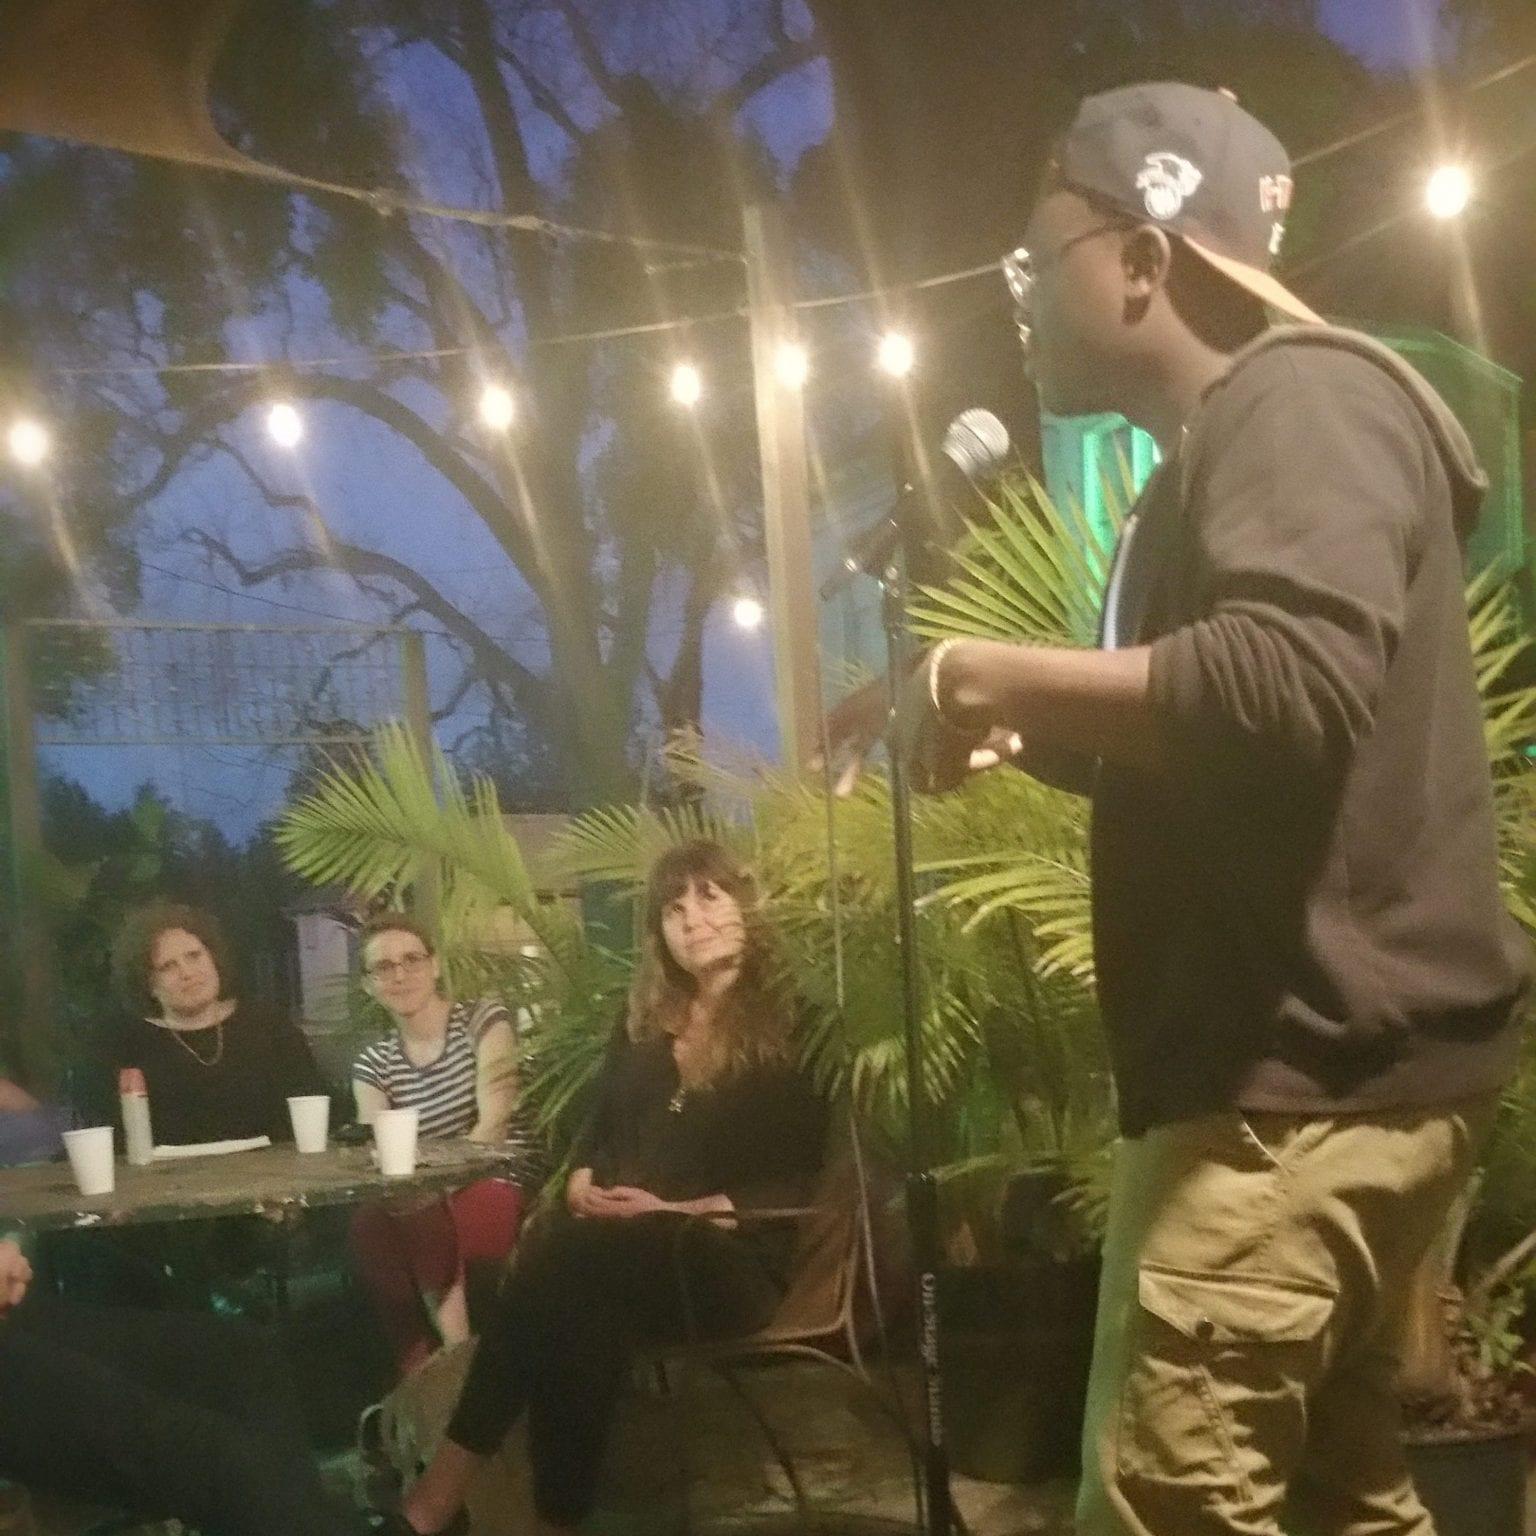 Grackle and Grackle Workshops Bryan Washington Fiction